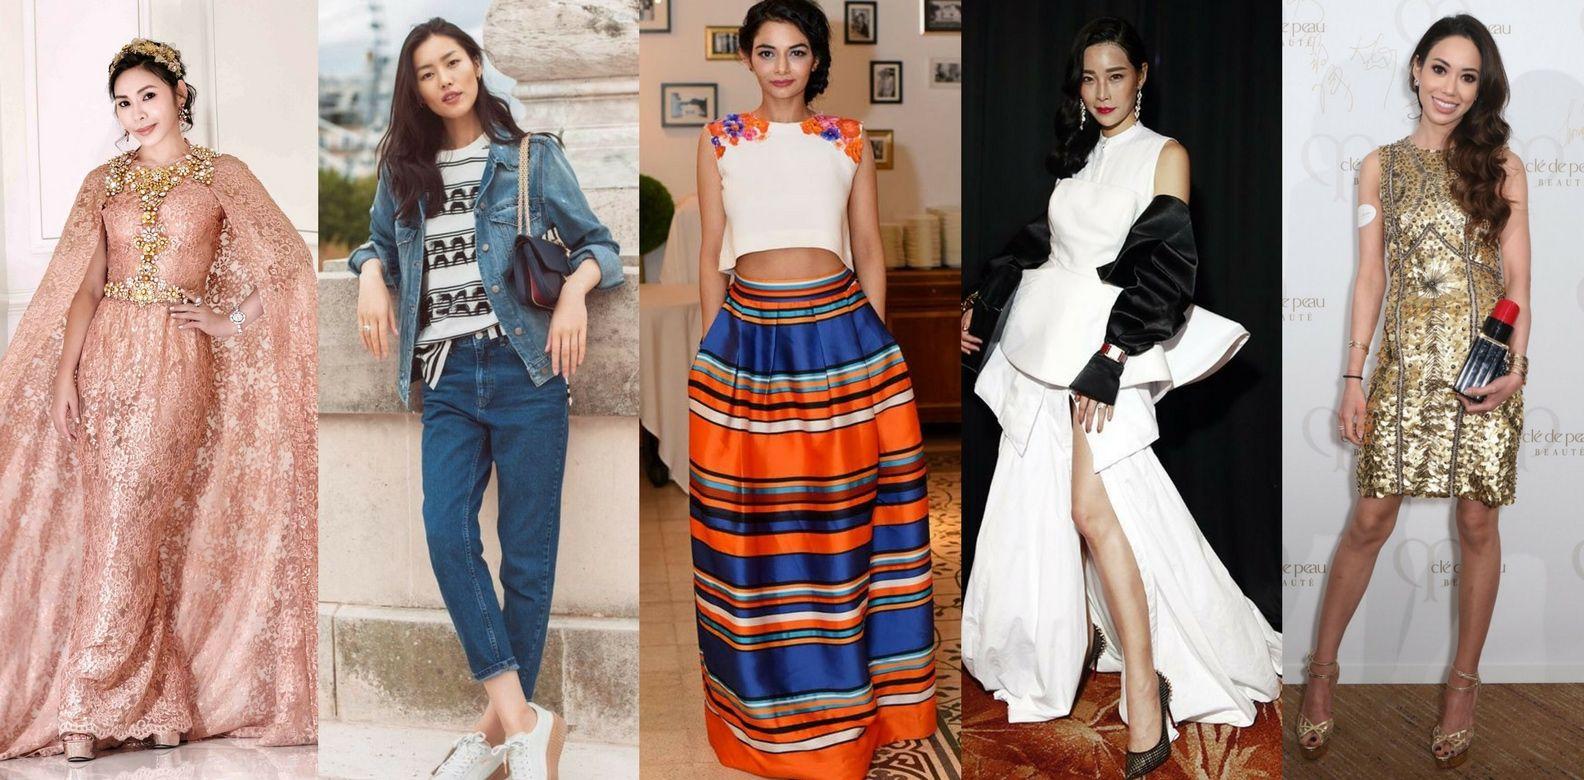 Asia's Most Stylish: 85 Fashion-Forward Women To Know